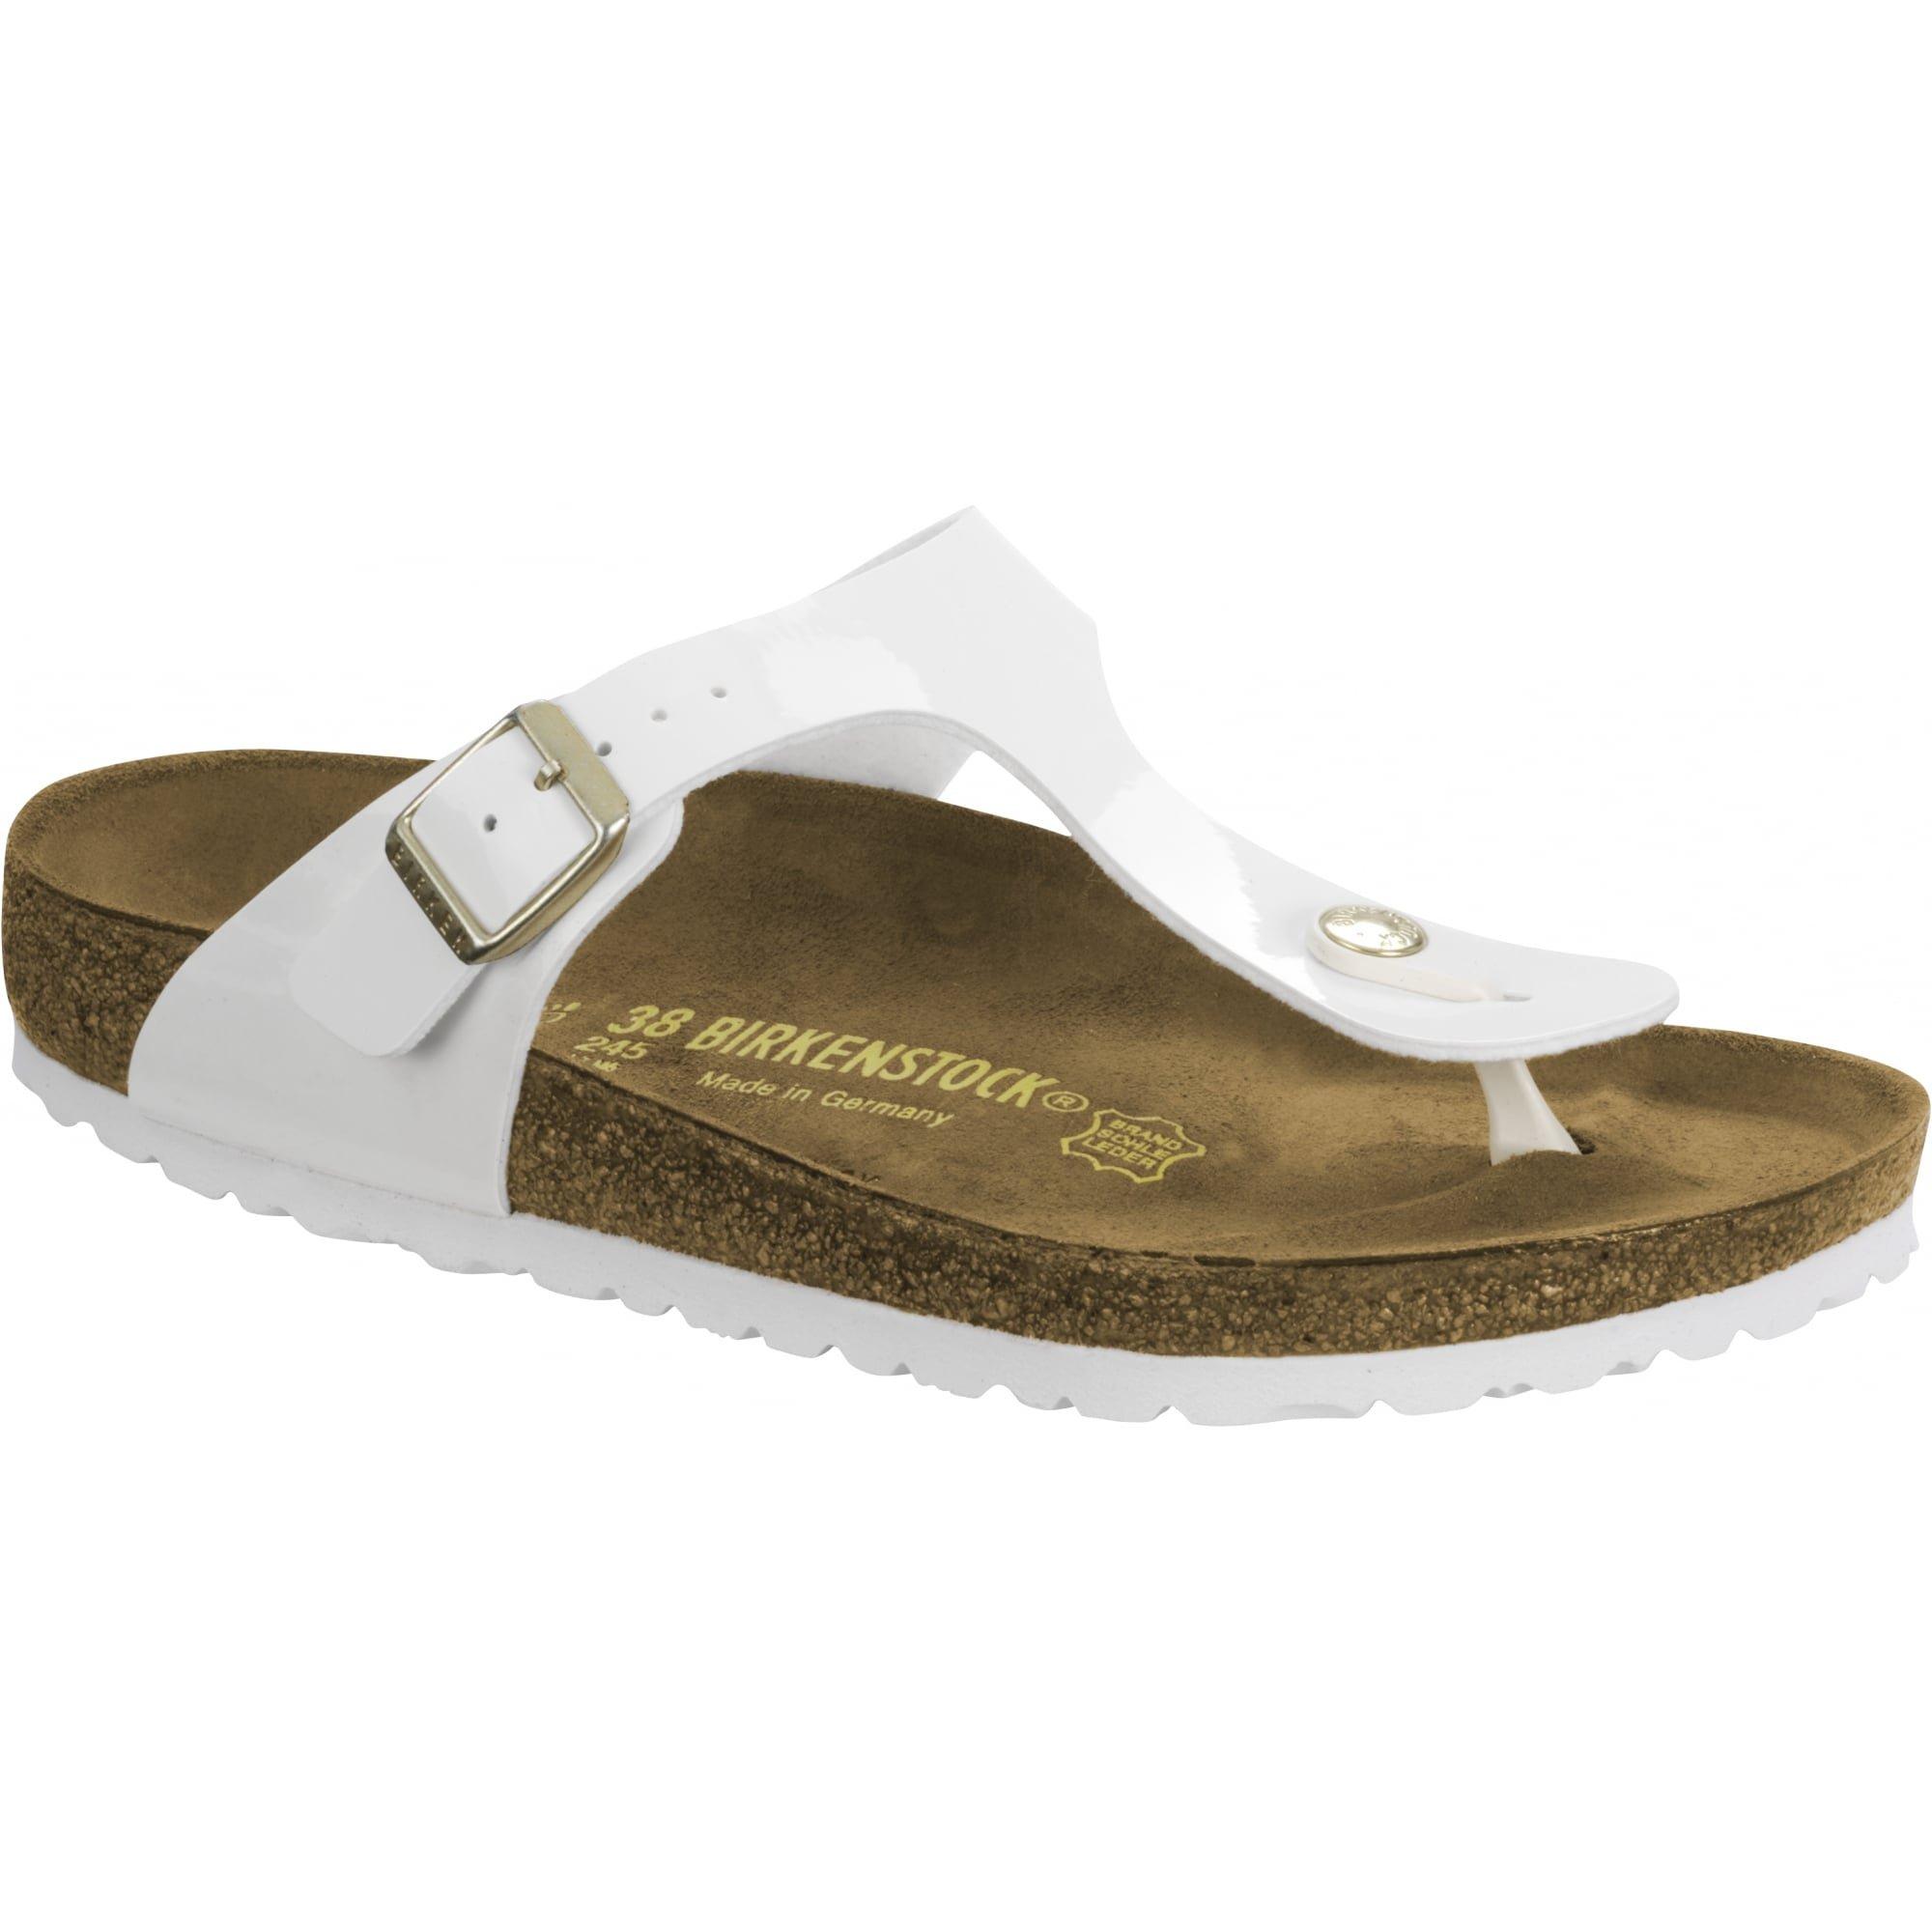 Birkenstock Women's Gizeh BirkoFlor -Standard Fitting Buckled Toe Post Thong Style - Flip Flop Sandal UK8 - EU41 - US10 - AU9 White Patent by Birkenstock